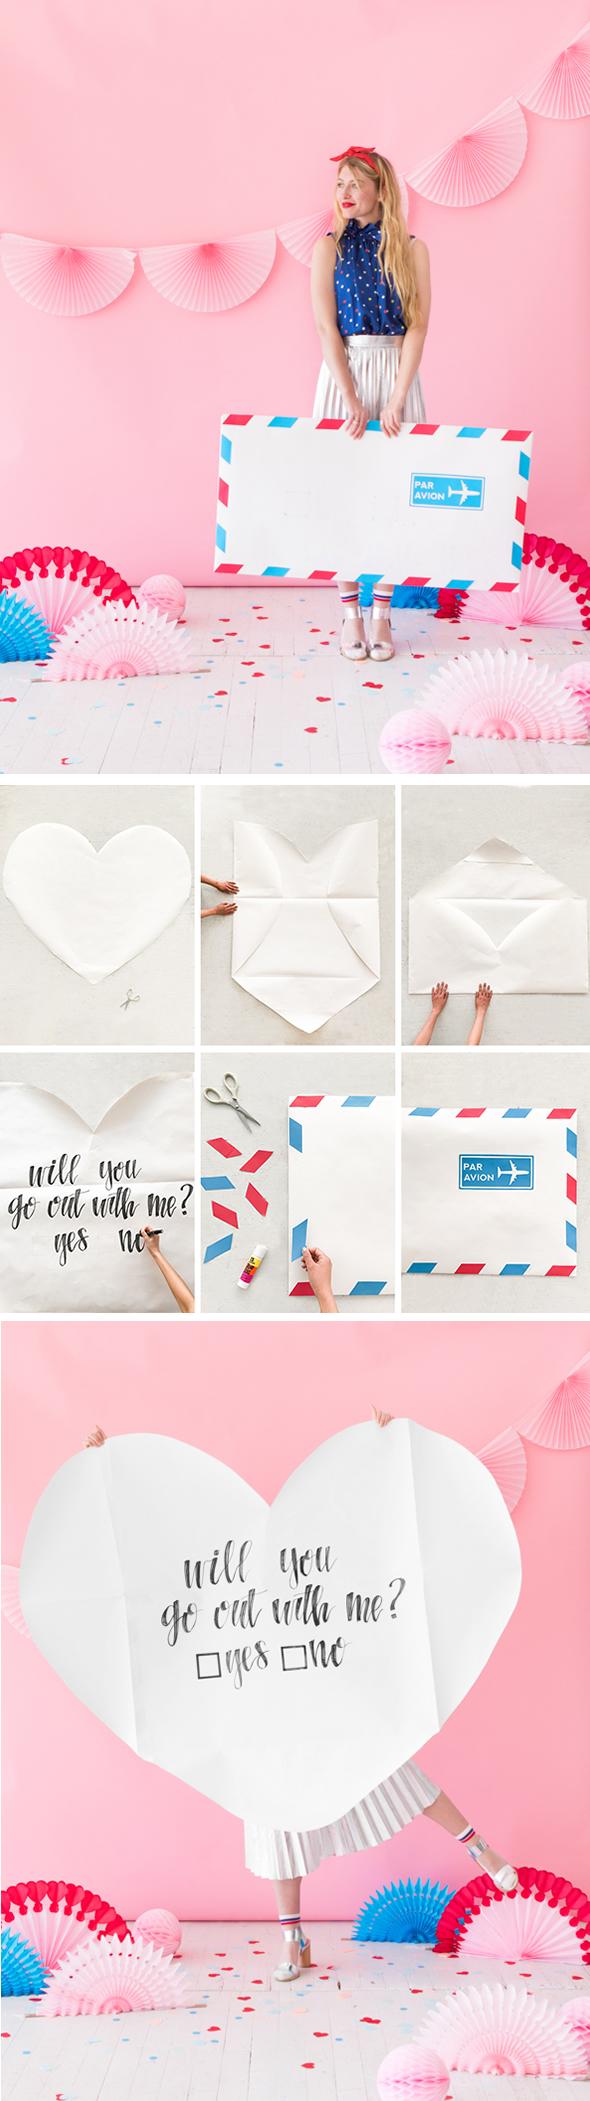 Surpresa de Dia dos Namorados Simples e Rápida